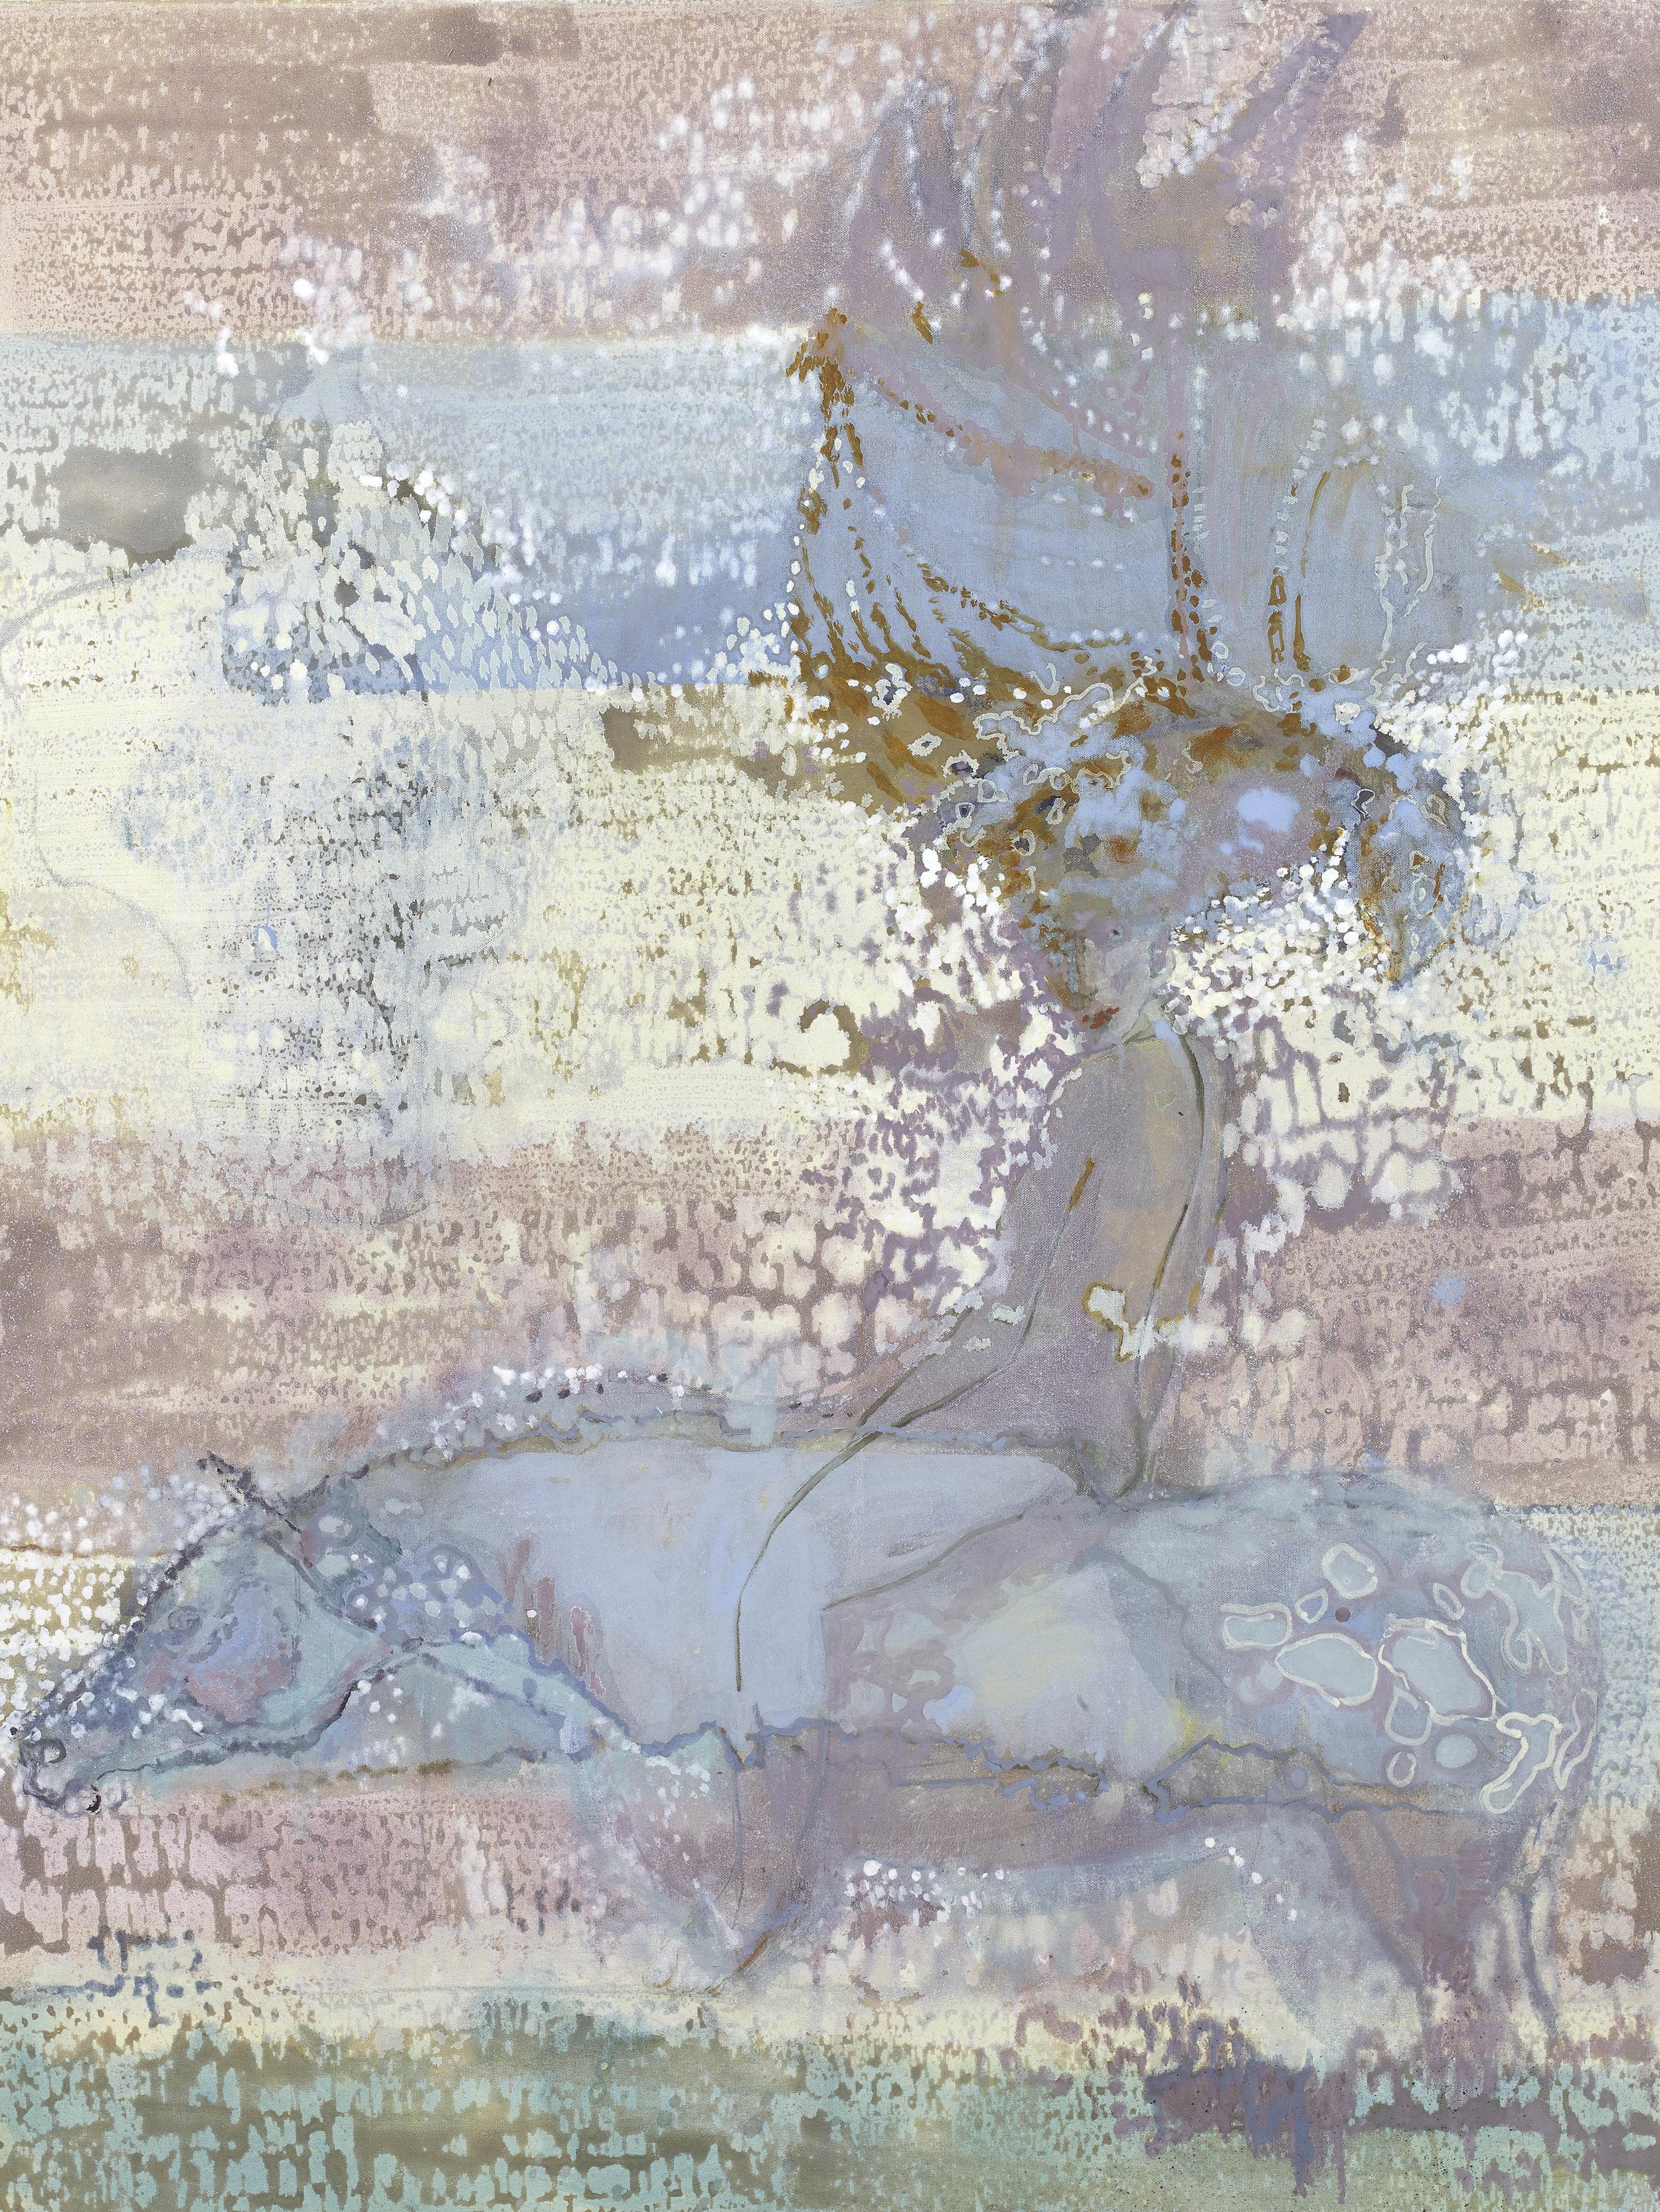 'The Hunter' oil & pigment on linen 121 x 90 cms